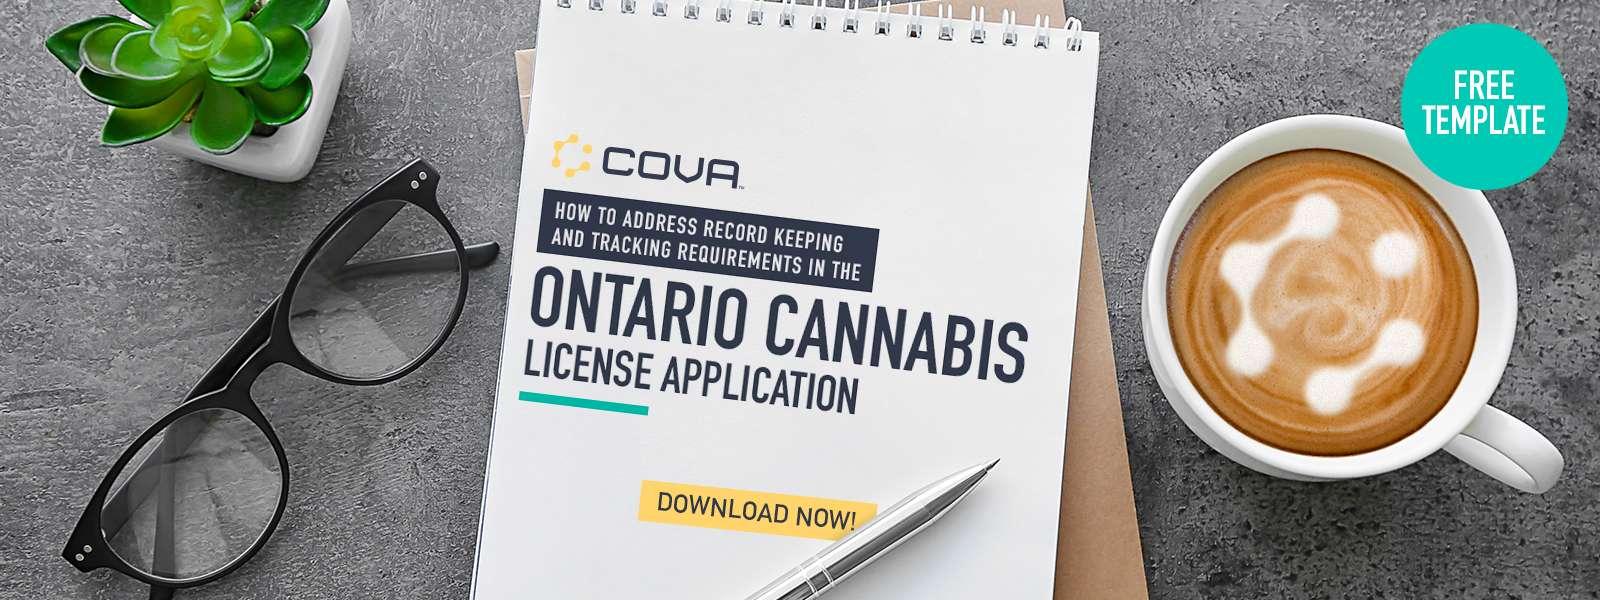 Cova-RFP-Ontario-Landing-Page (1).jpg